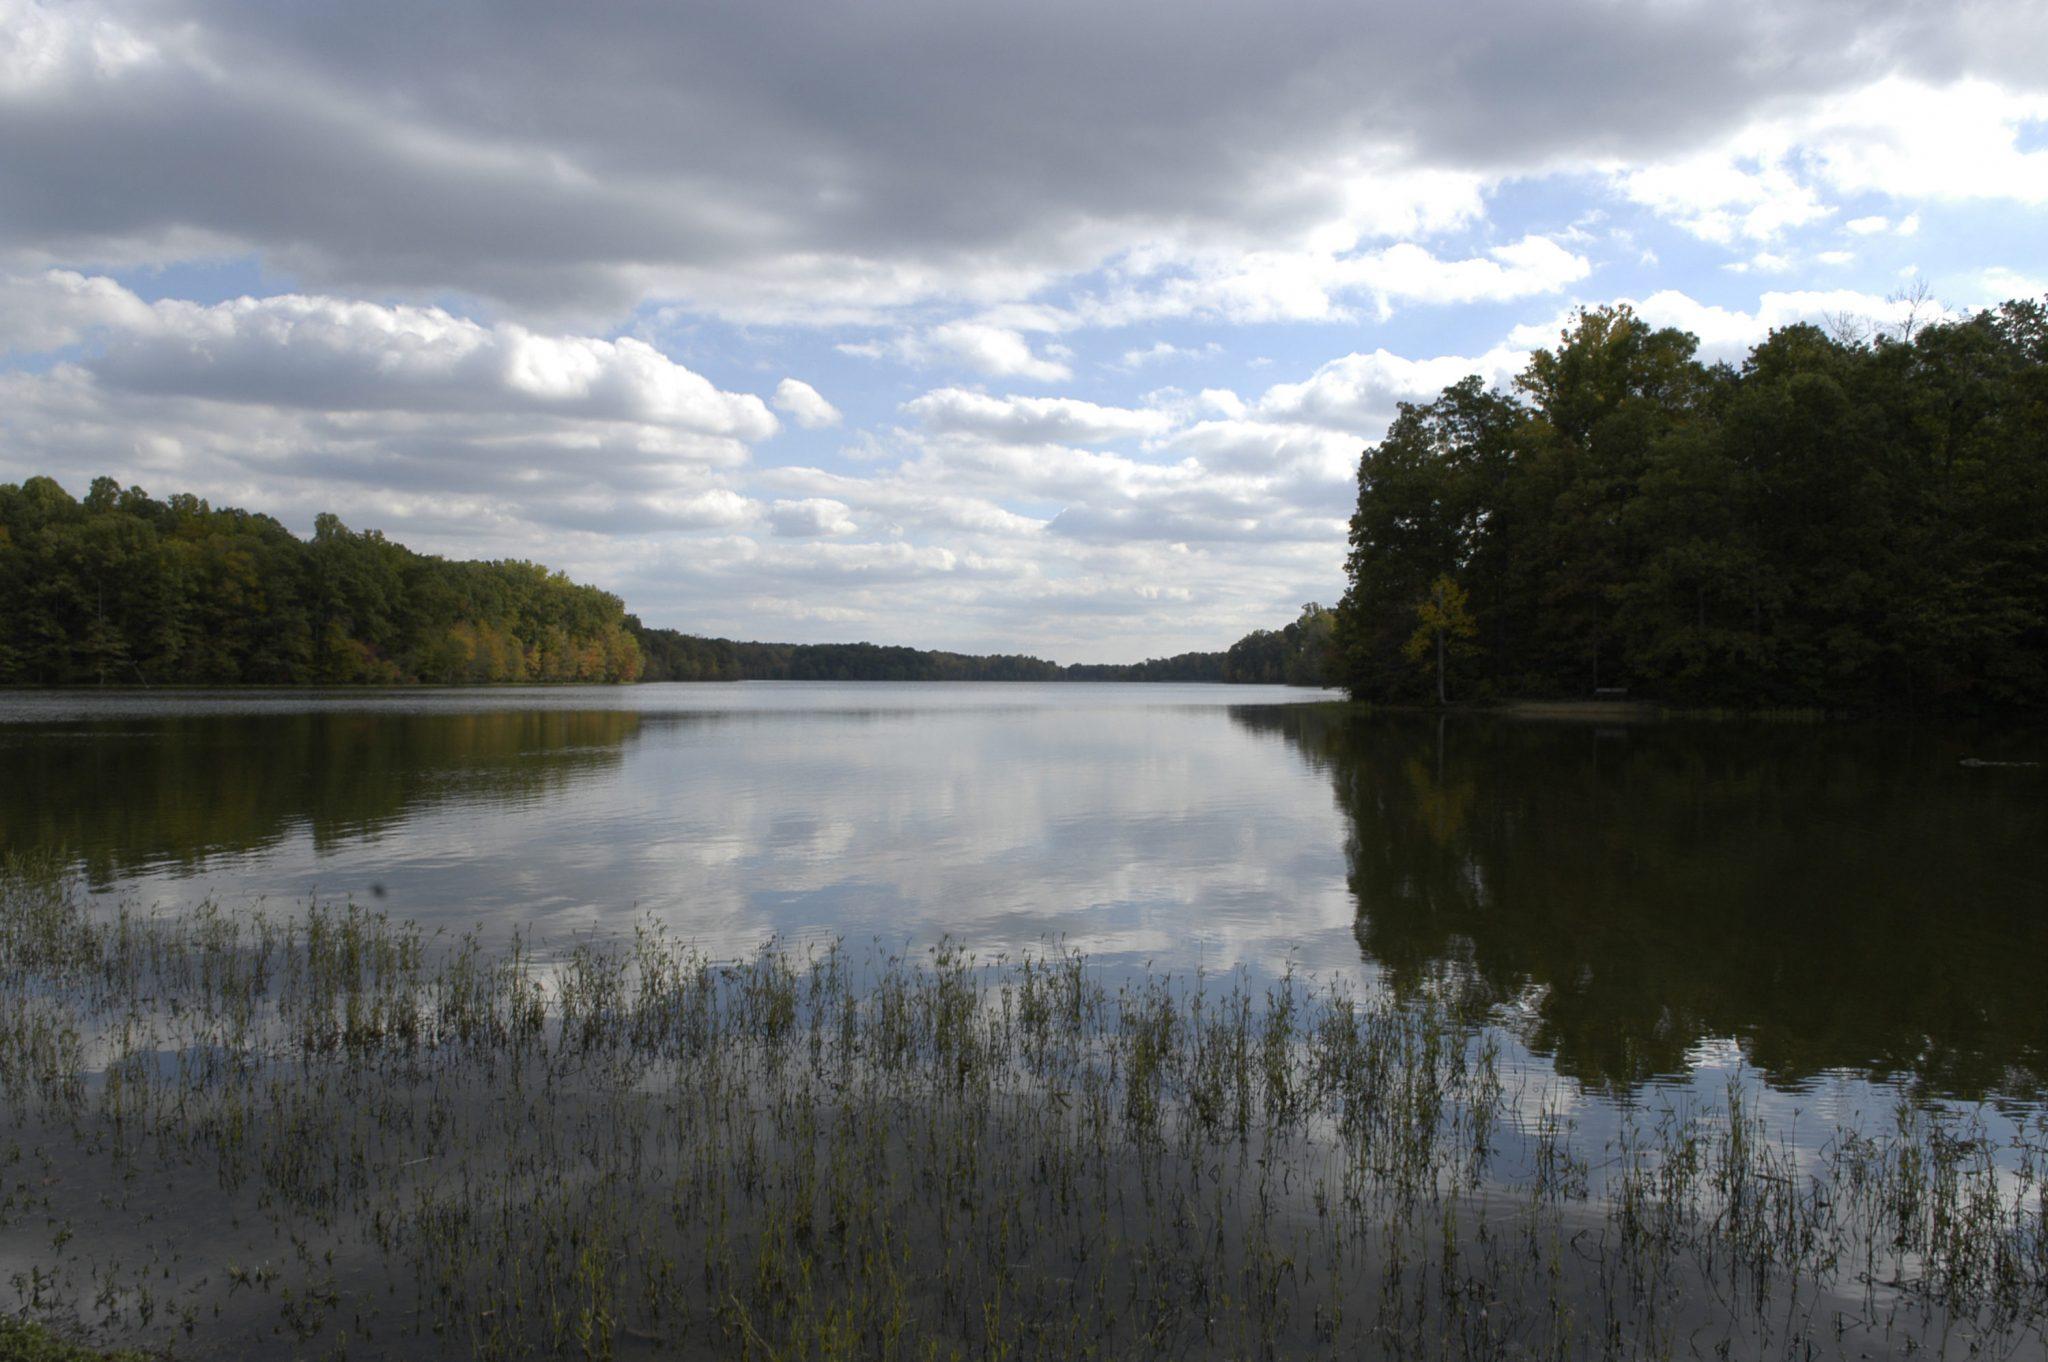 Park Wars: Burke Lake Park Wins